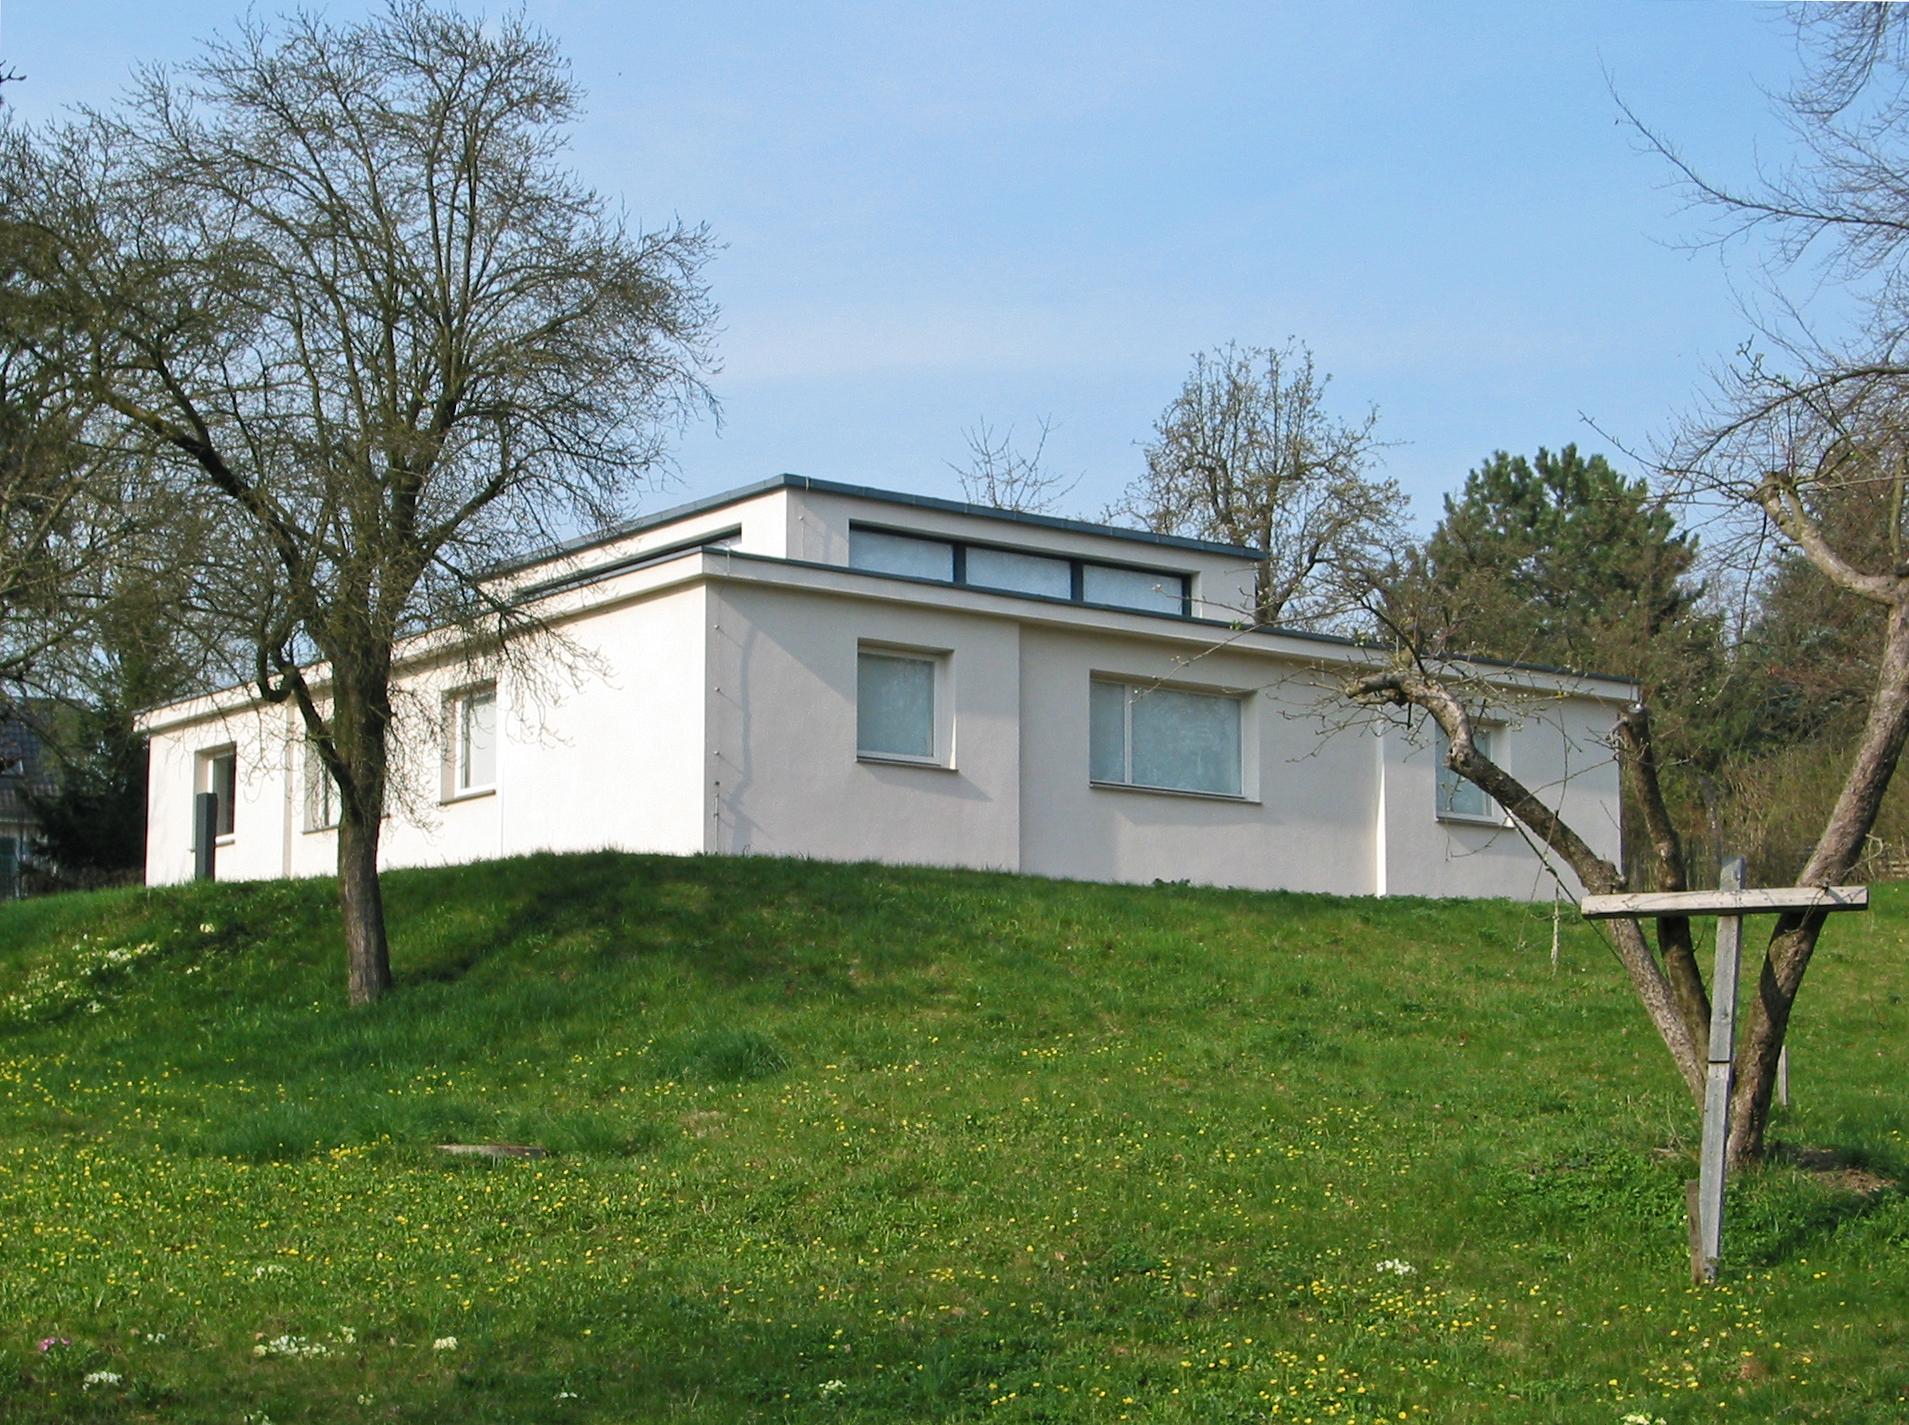 Haus Am Horn Weimar file haus am horn weimar südwestansicht jpg wikimedia commons